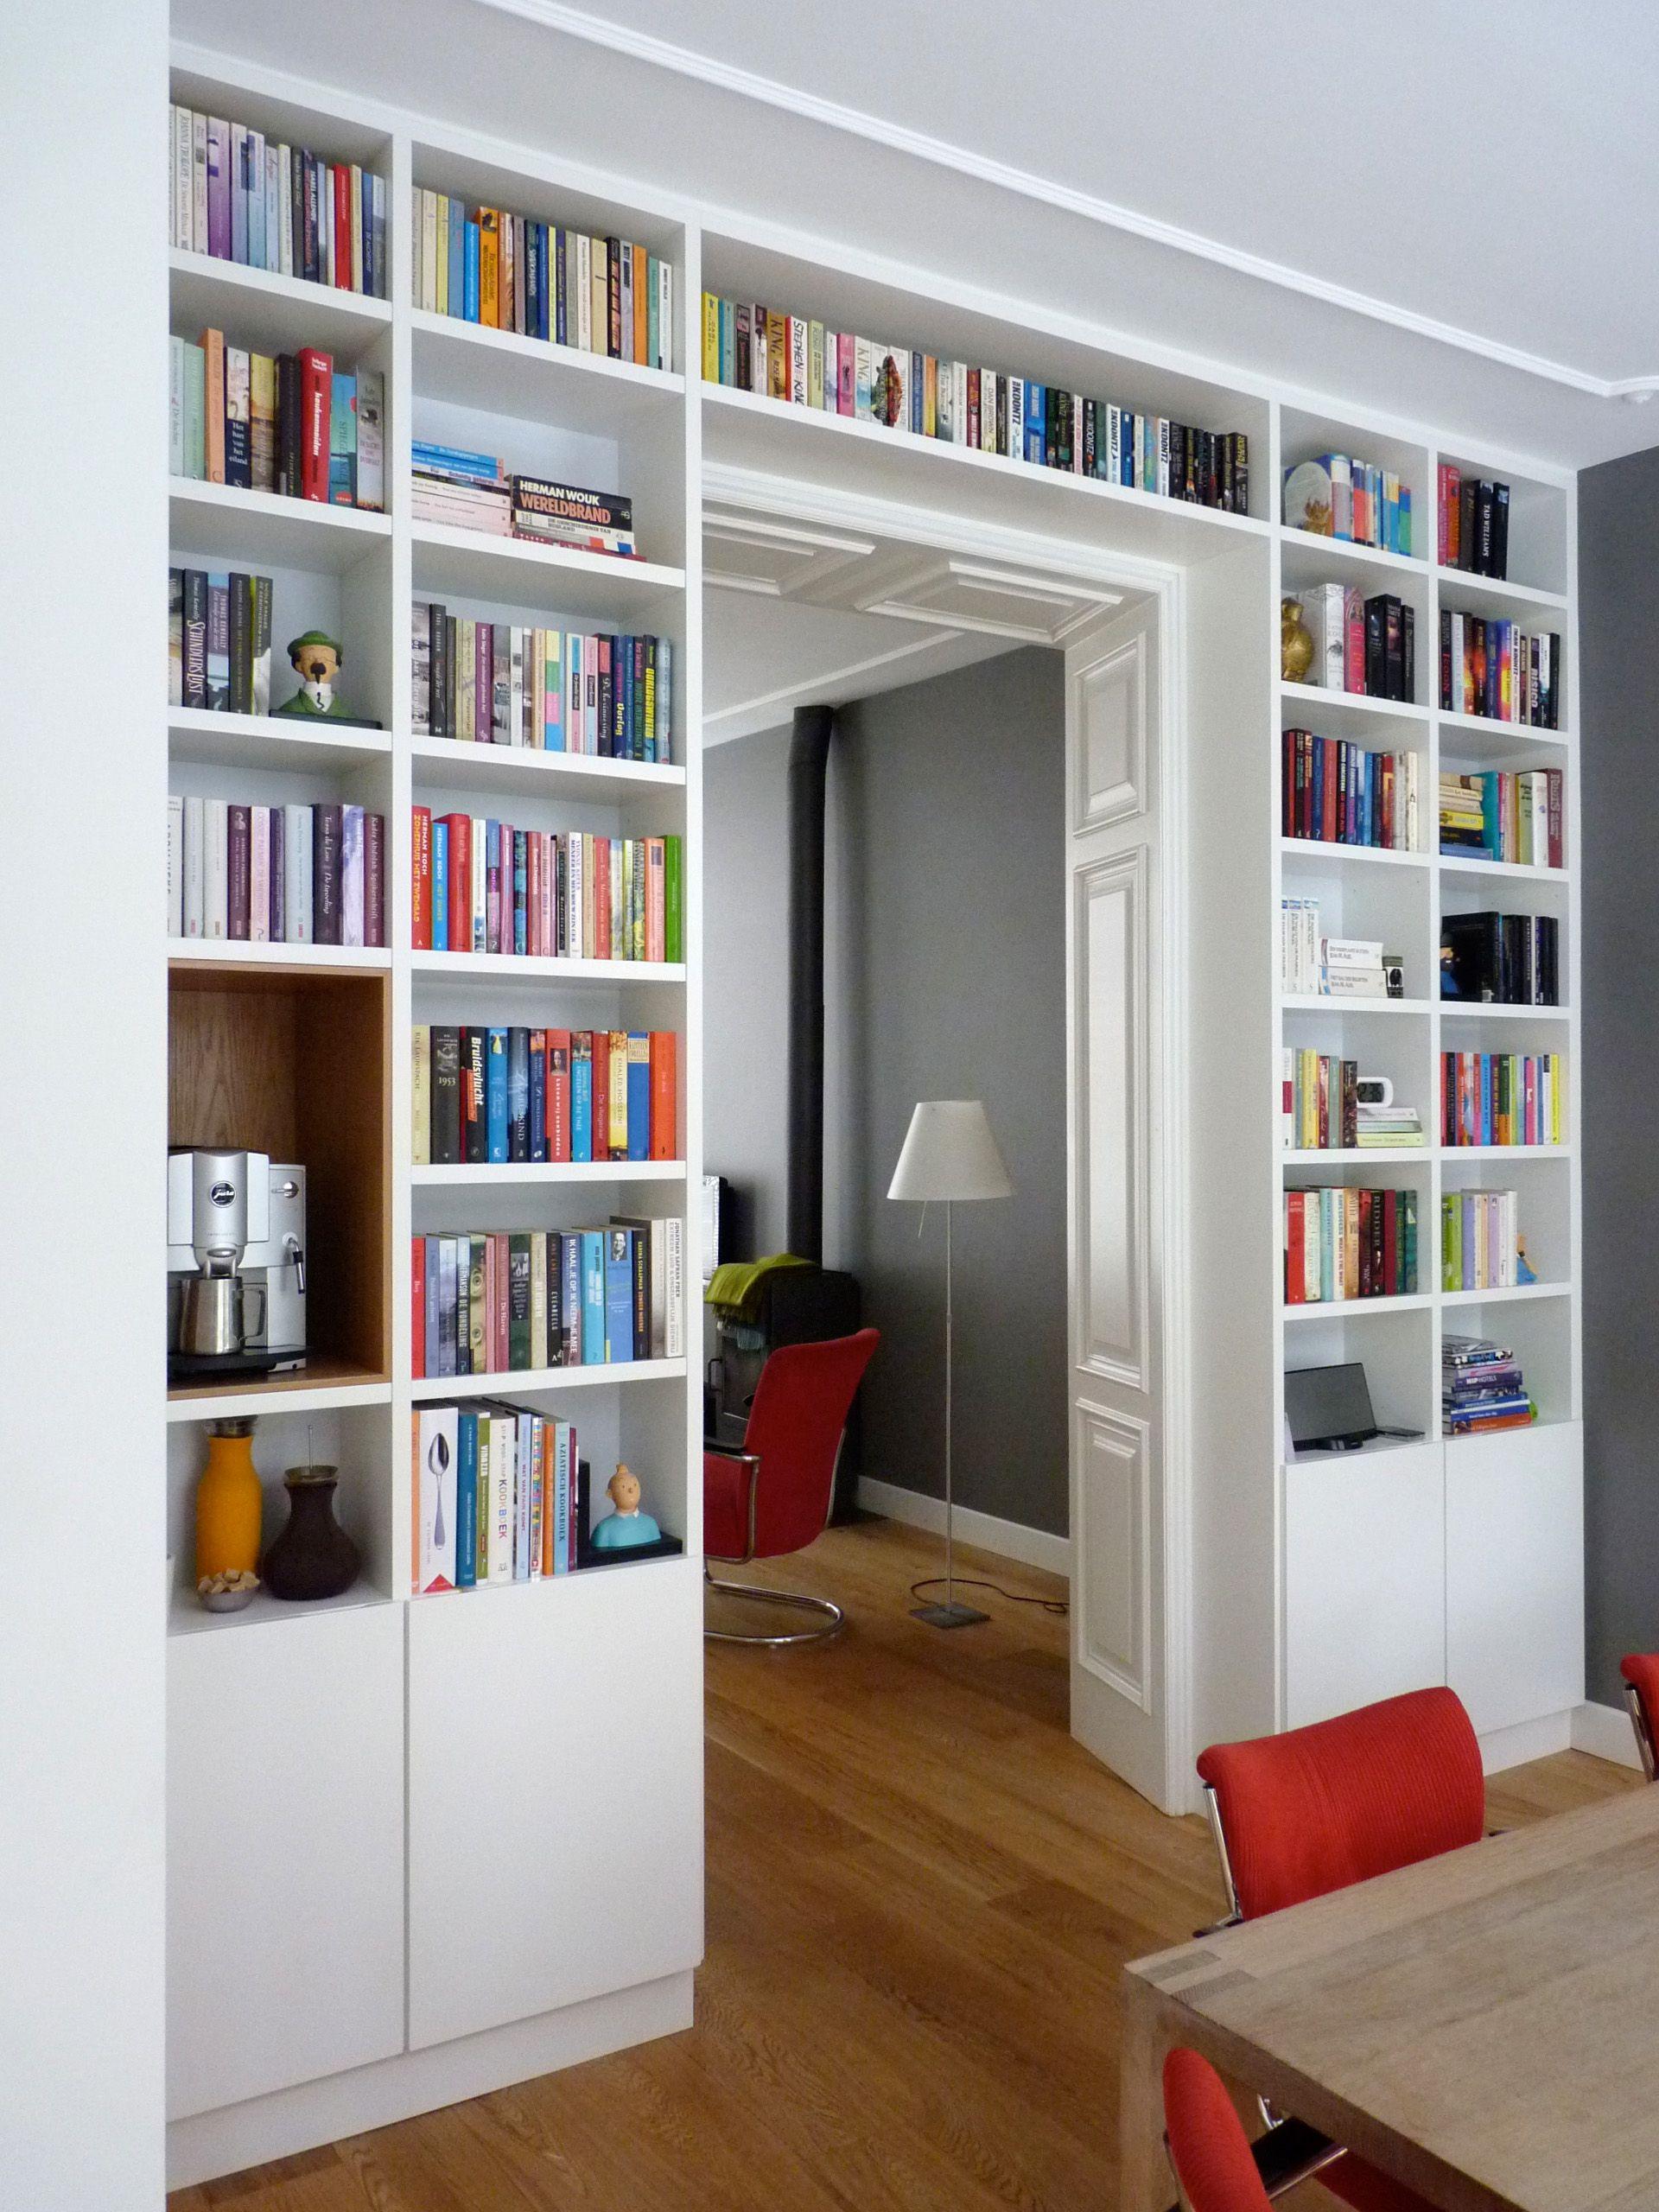 kastenwand woonkamer - Google zoeken | Kasten in 2018 | Pinterest ...